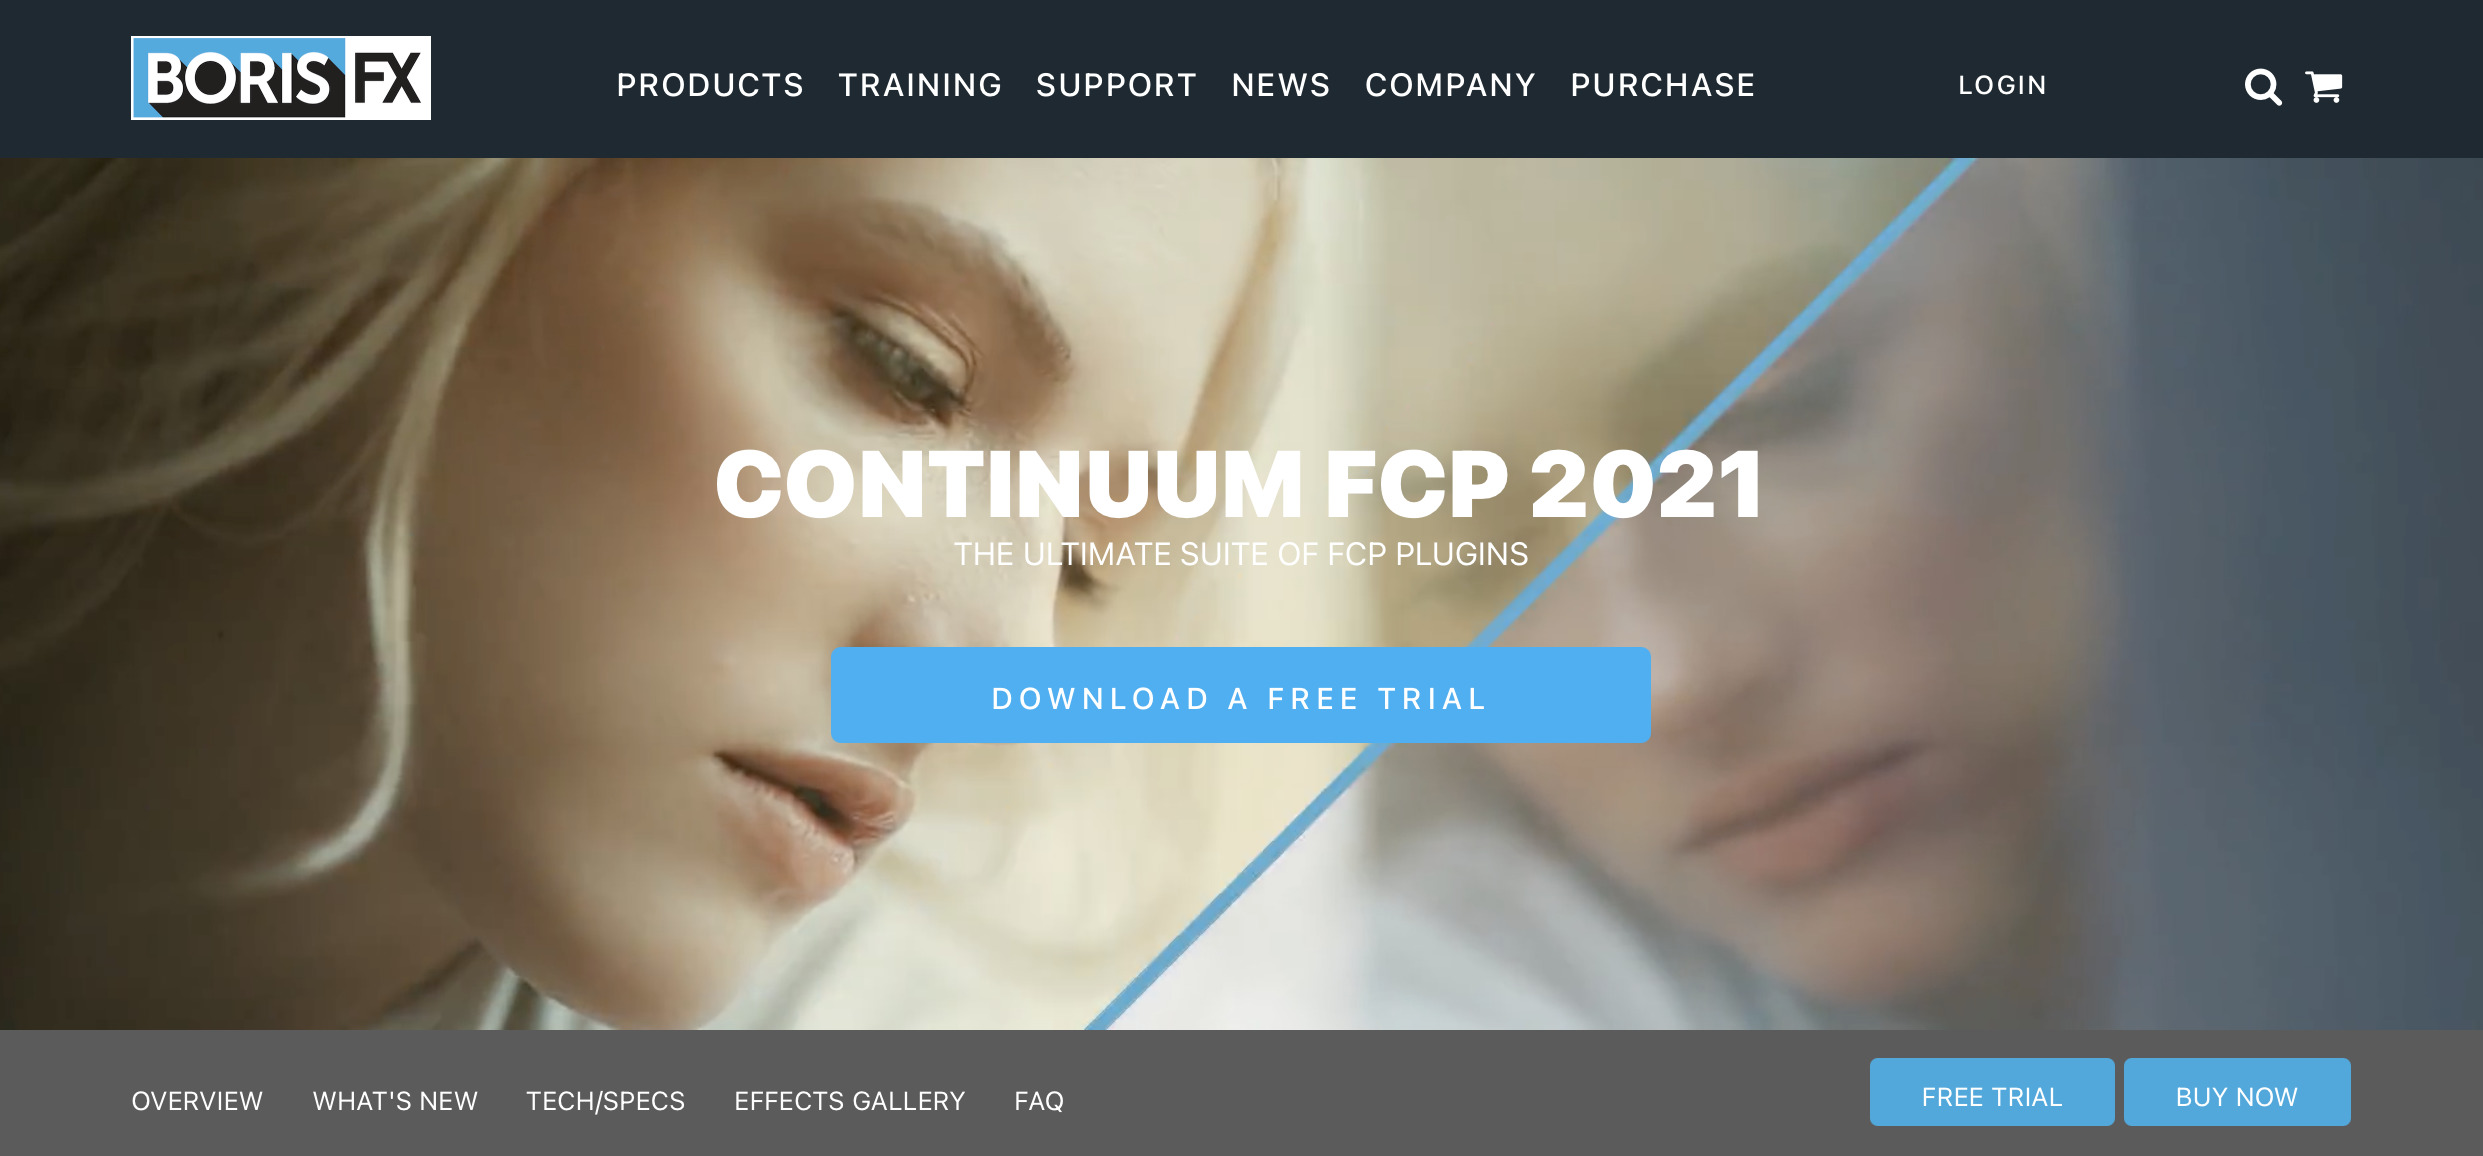 BorisFX Continuum 2021.5 for FCP 10